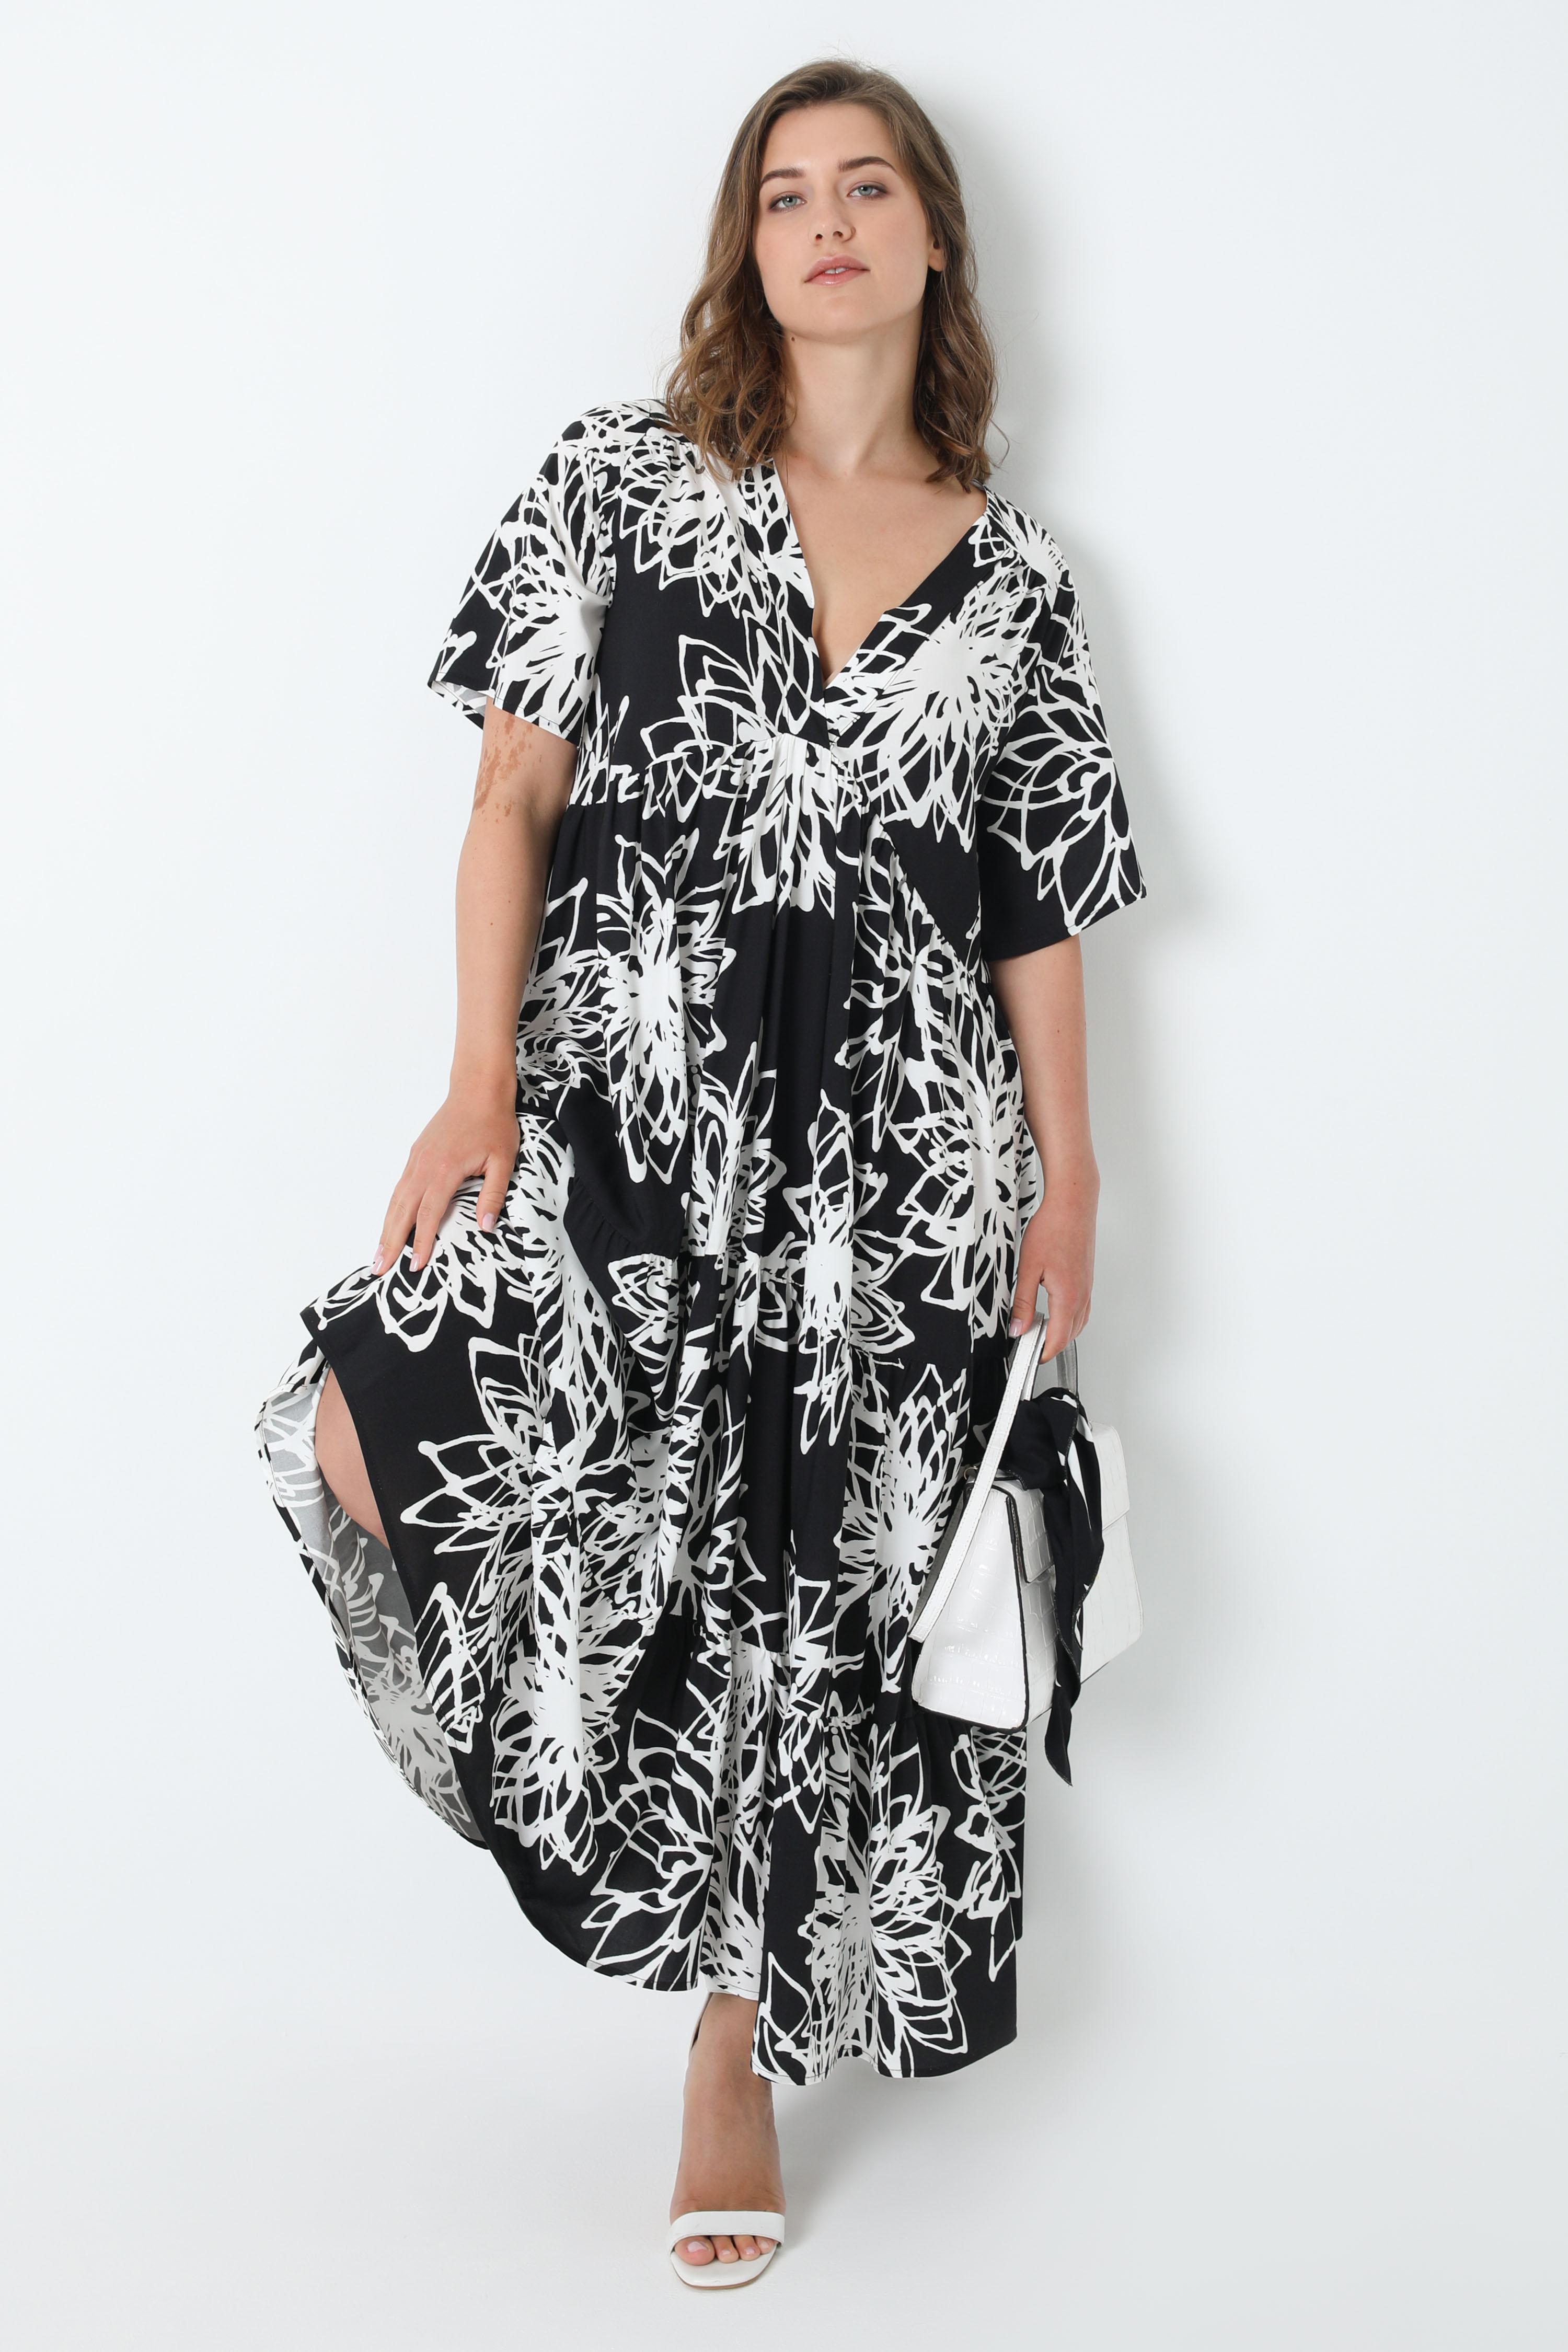 Long dress in printed fibranne (shipping June 20/25)